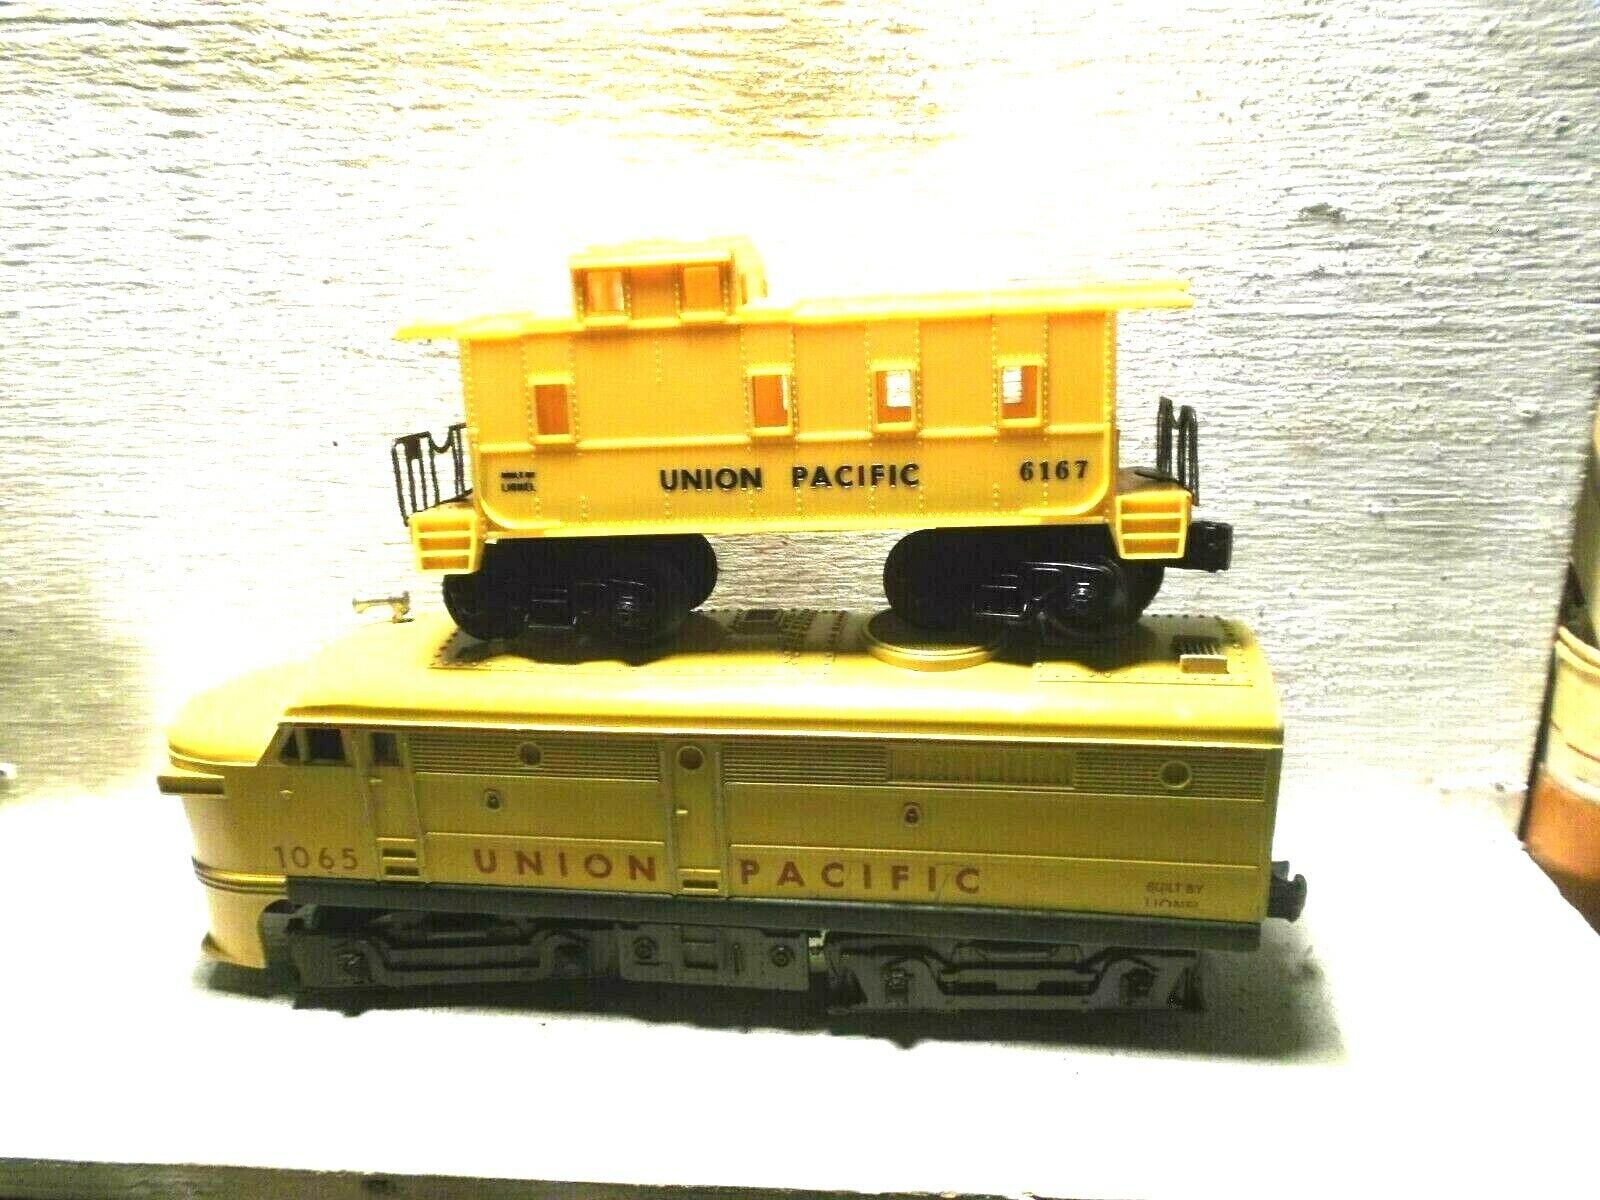 Lionel 1065 Alco- Looks&Runs Great  2 Pos E Unit-6167 Postwar UP Caboose-Exc